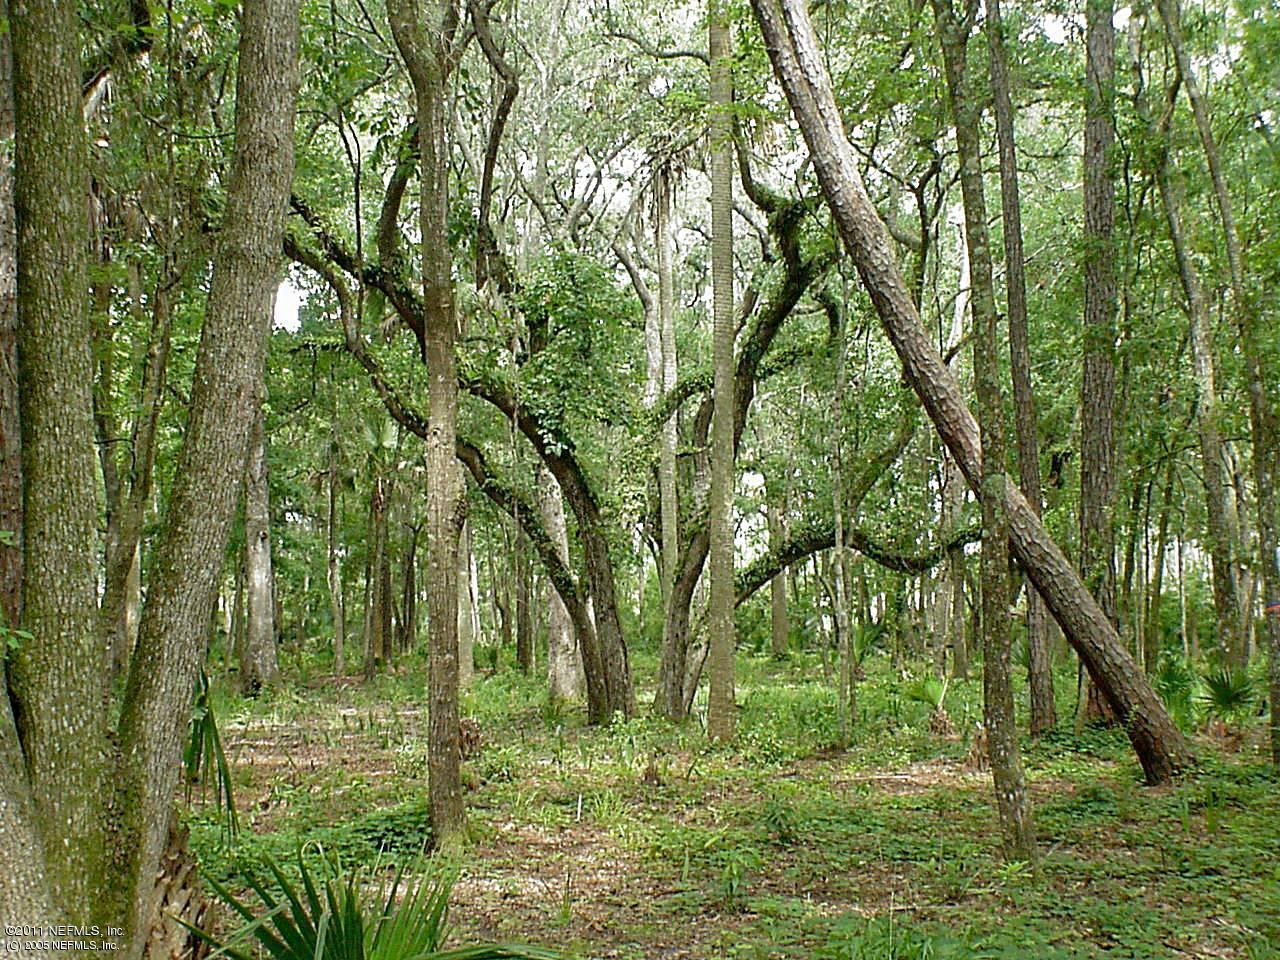 9707 OAK HAMMOCK, JACKSONVILLE, FLORIDA 32256, ,Vacant land,For sale,OAK HAMMOCK,587992